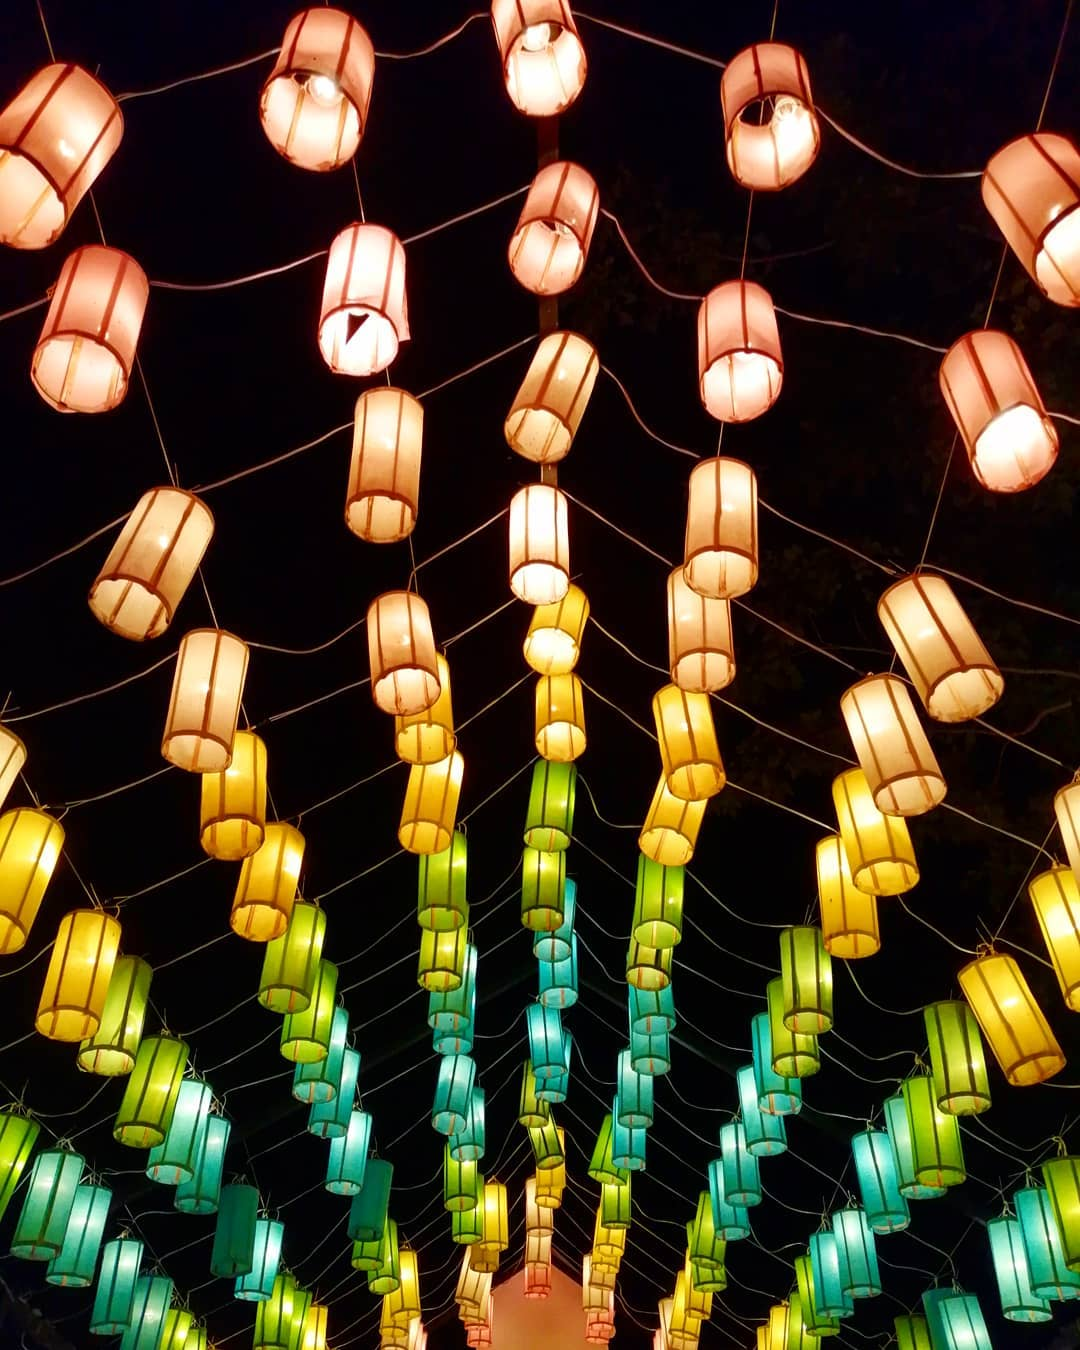 Allemaal gekleurde lantaarns